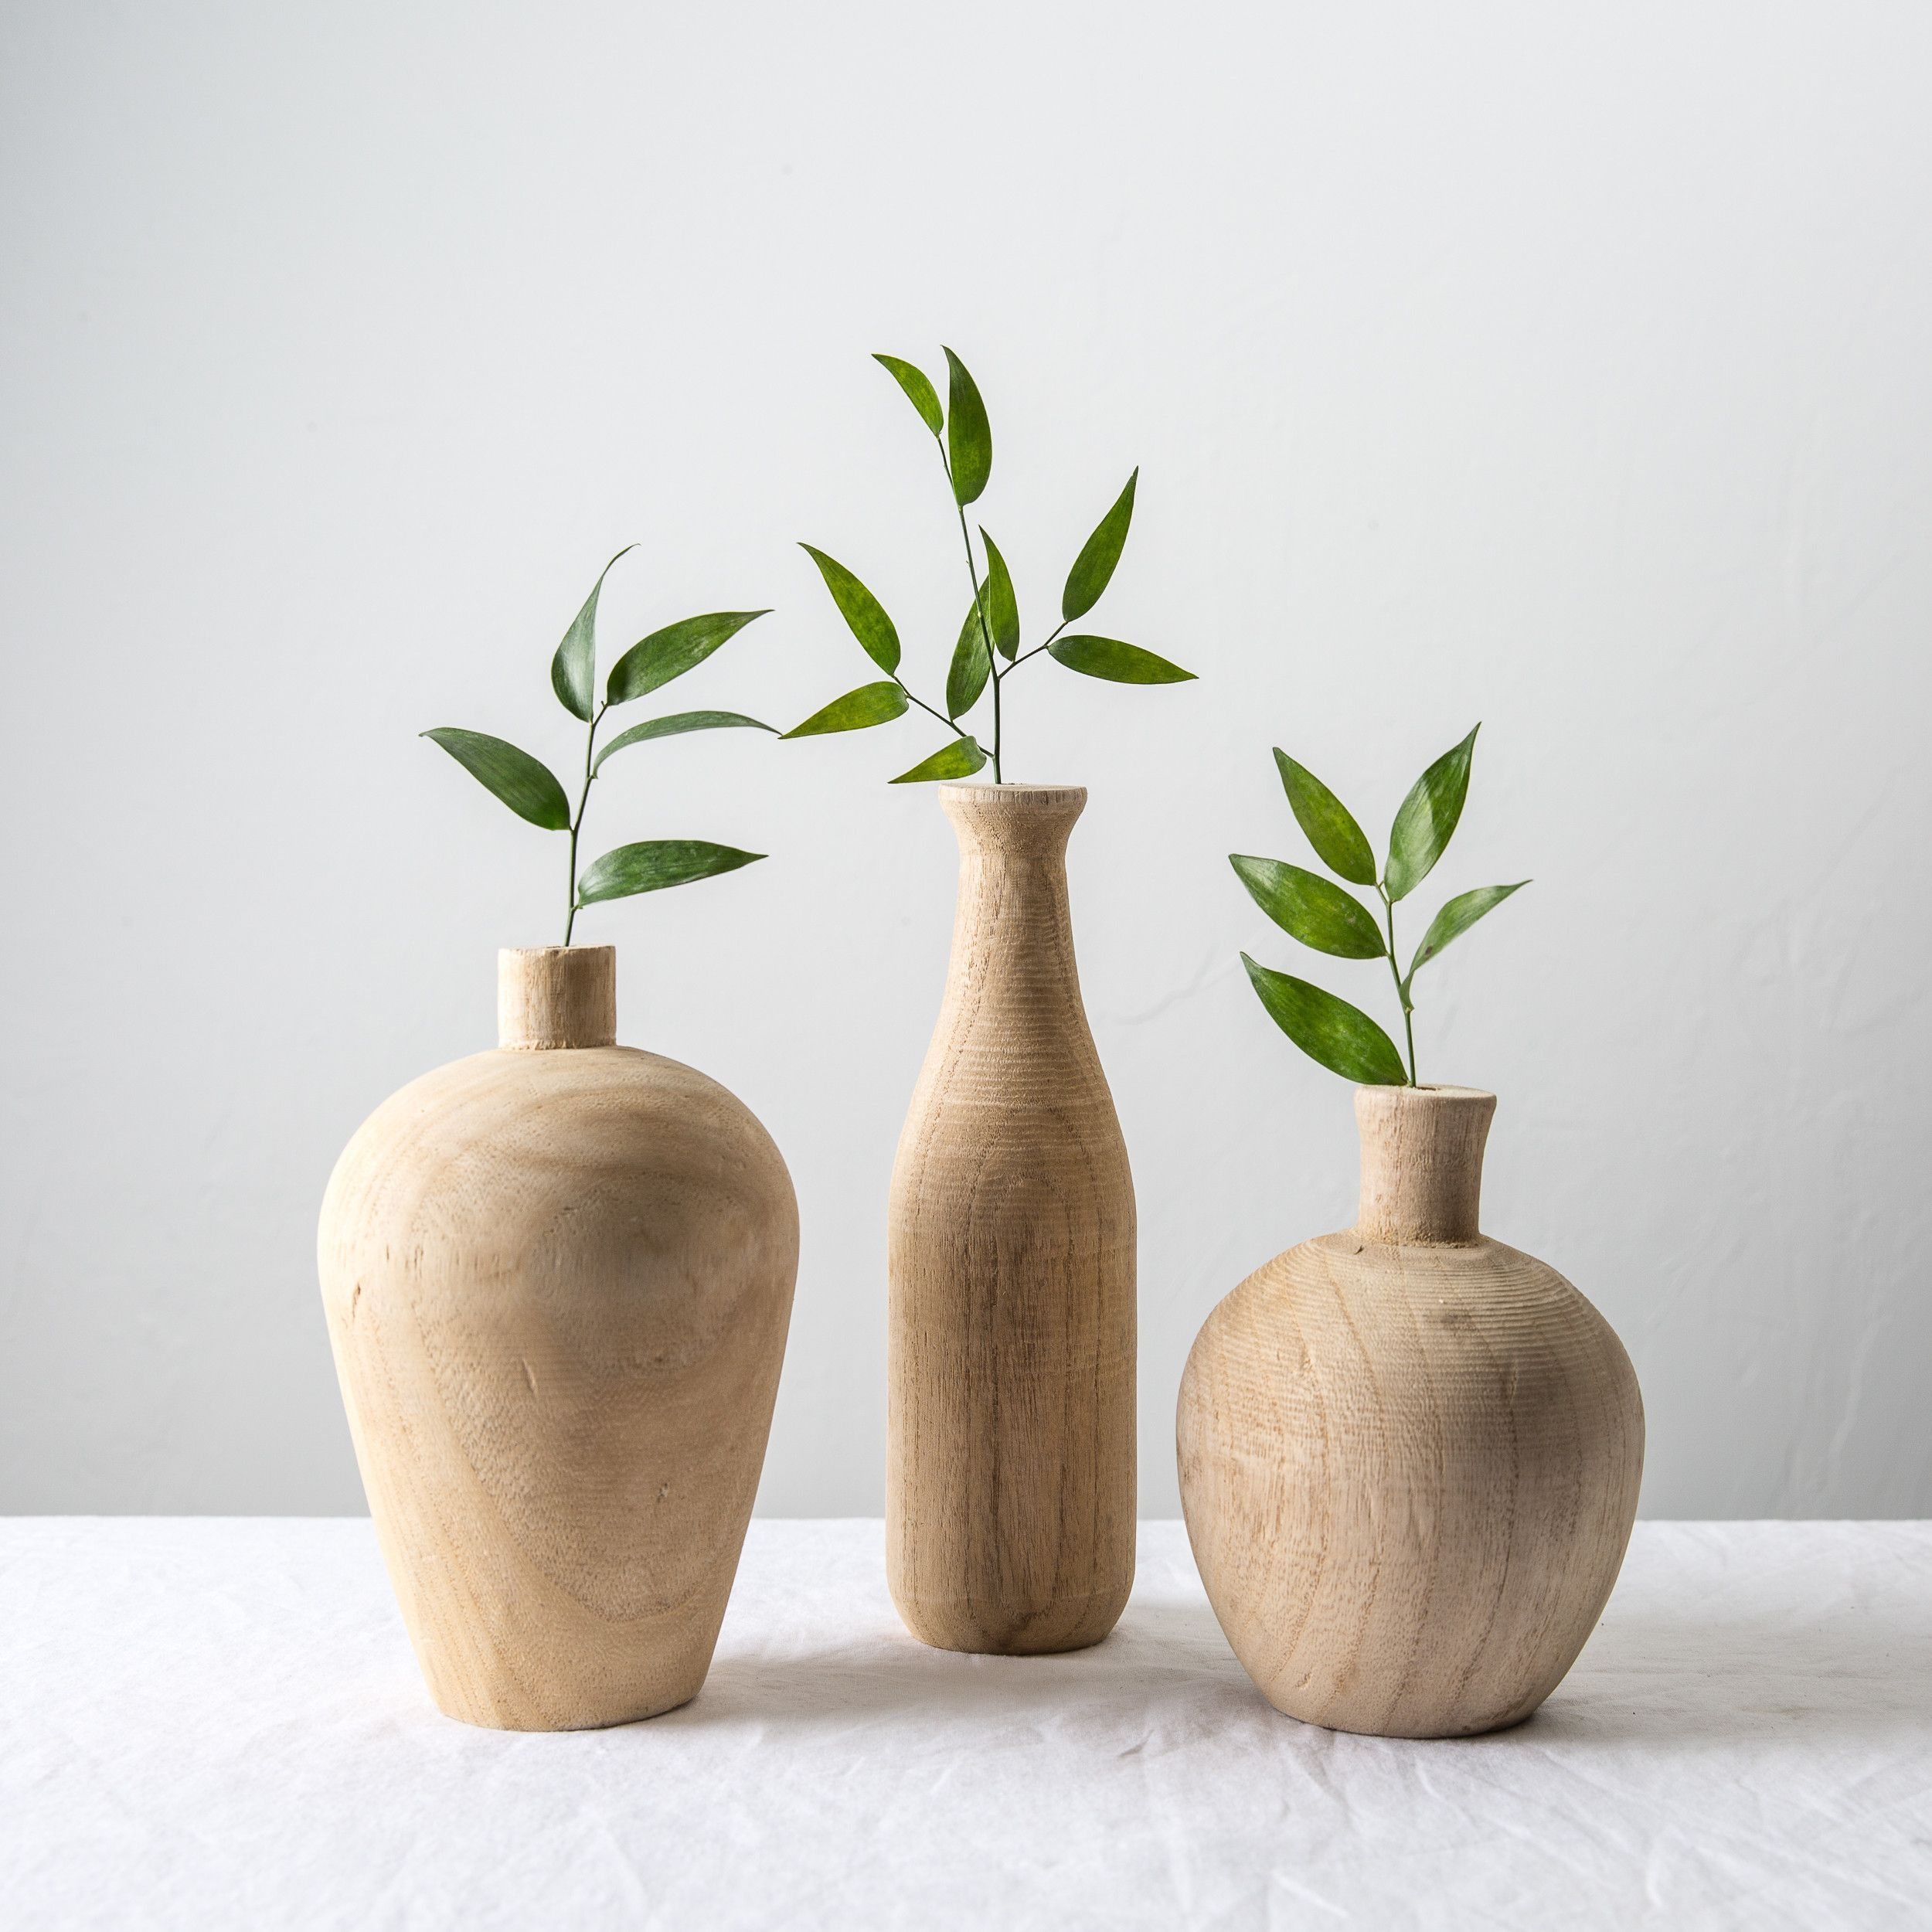 Paulownia wood vase wood grain shapes and third paulownia wood vase reviewsmspy